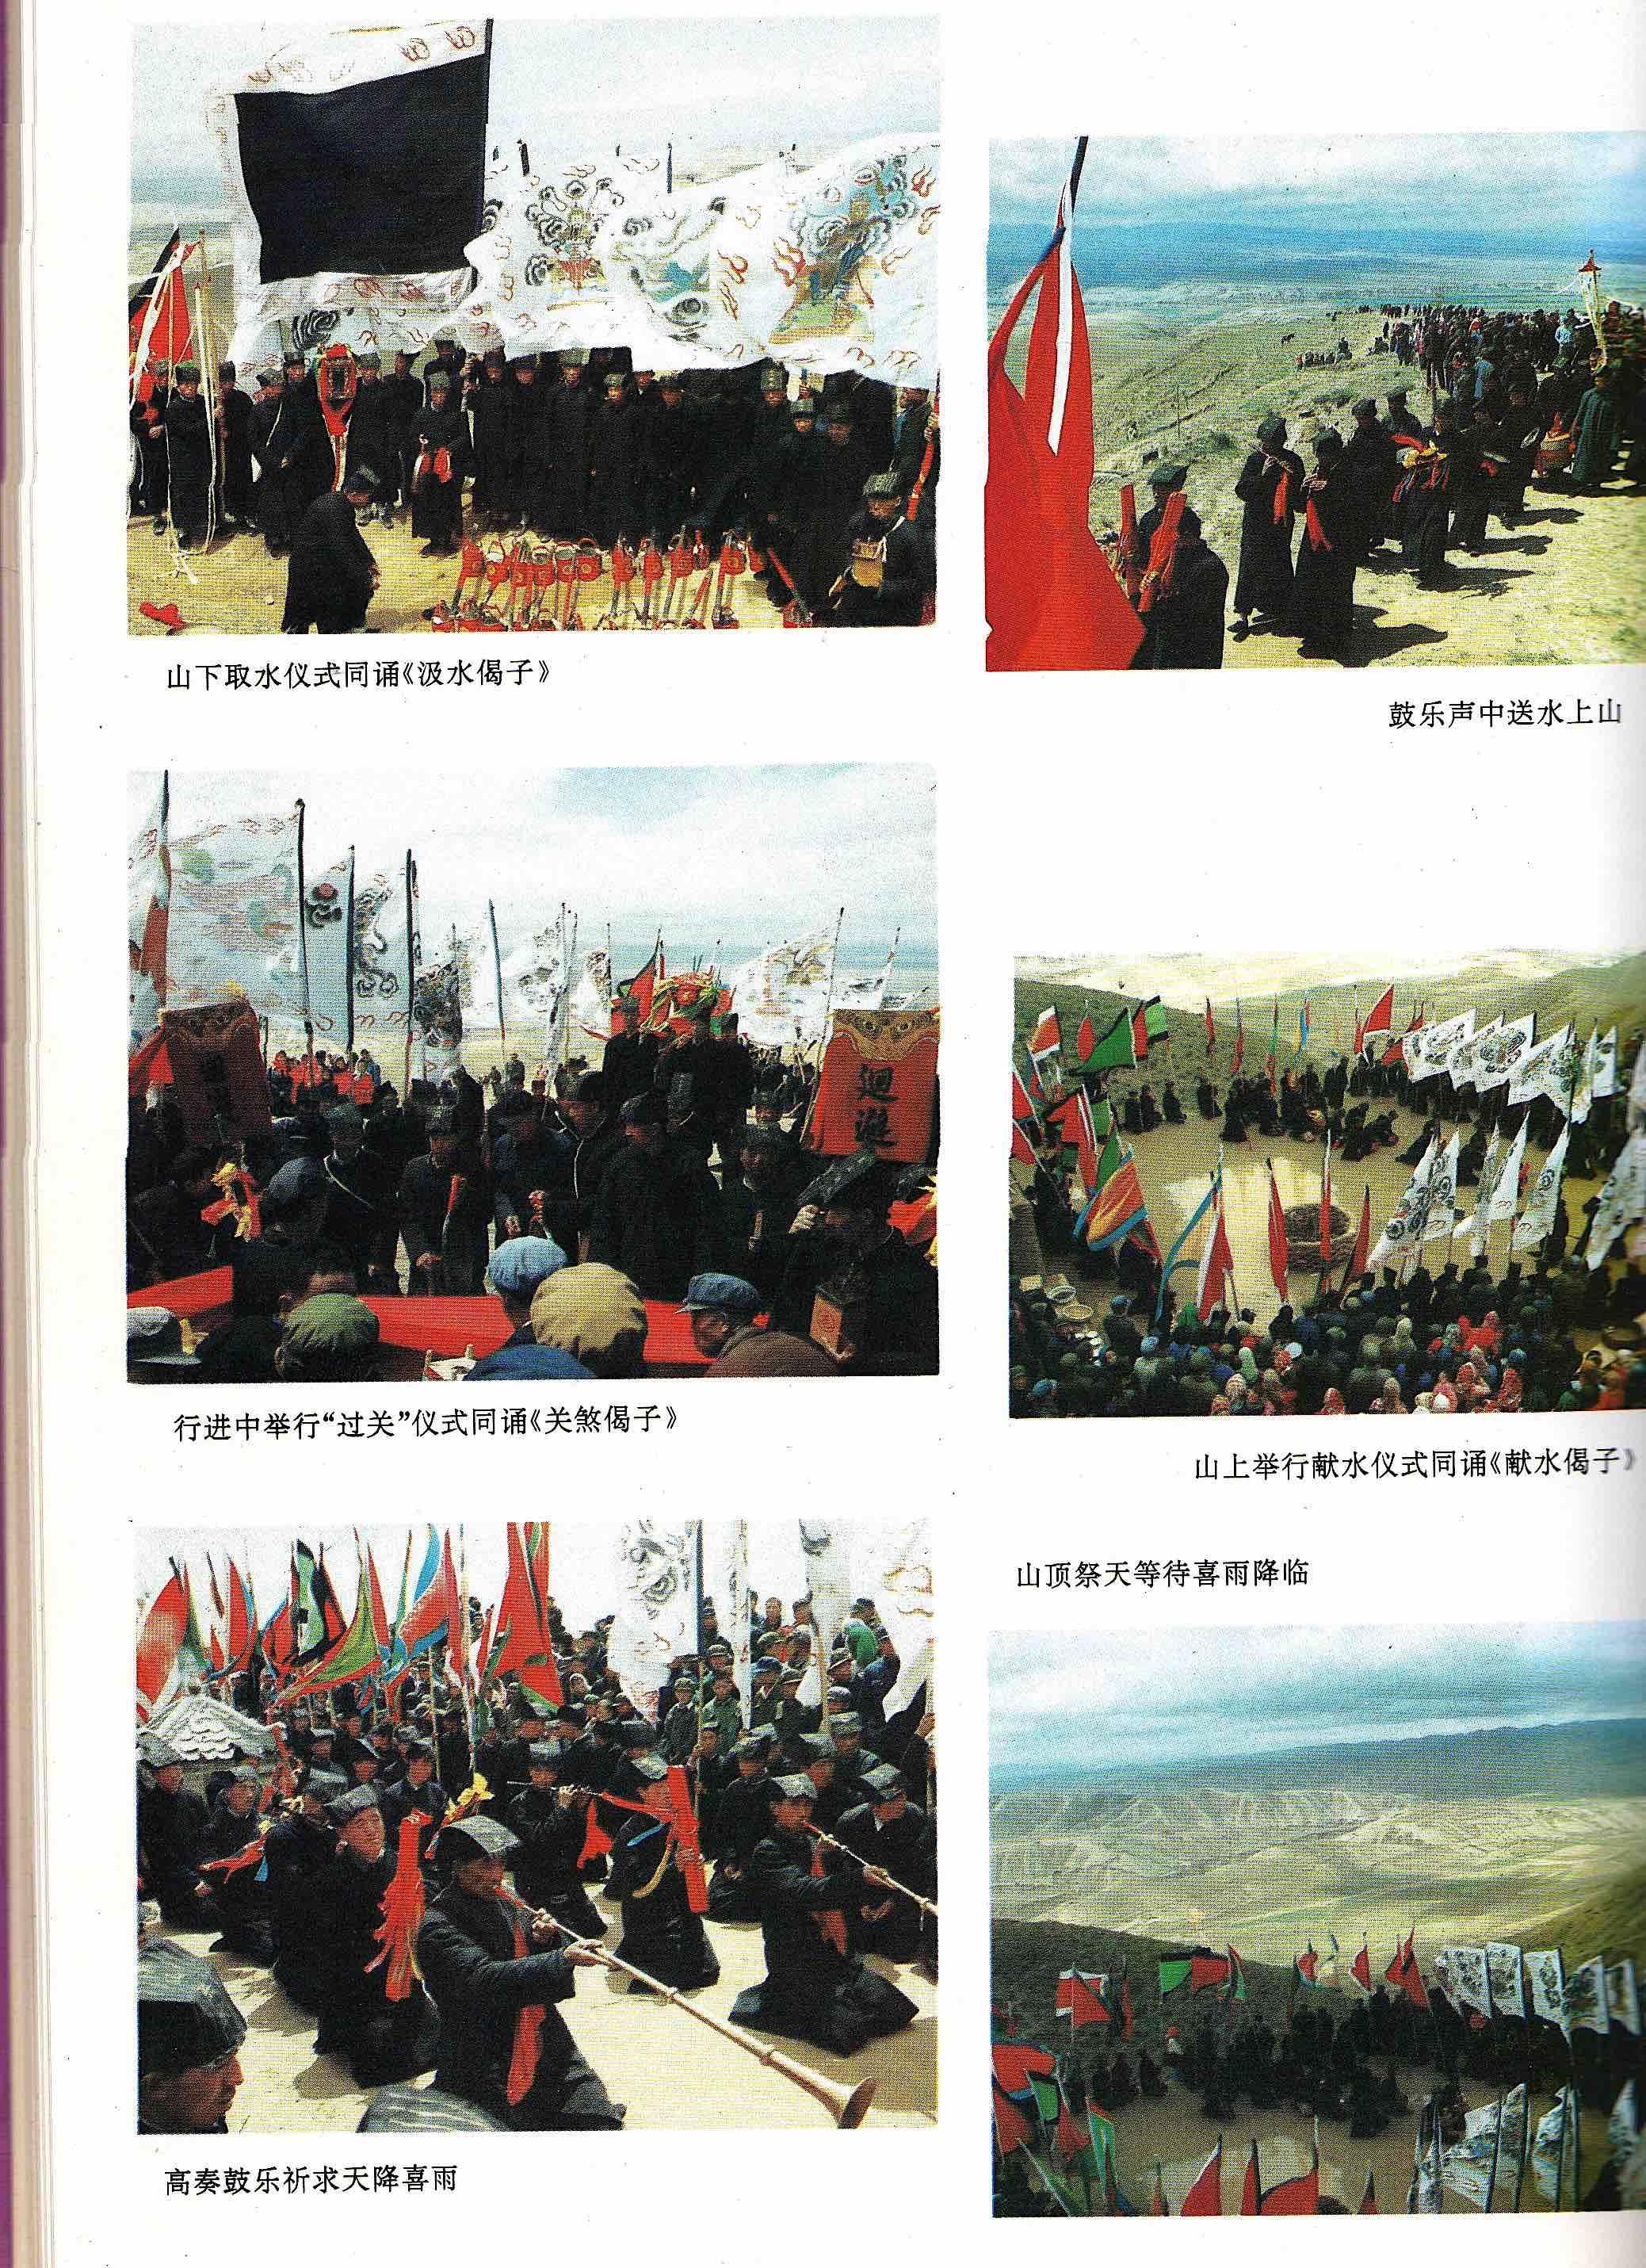 Lianhuashan